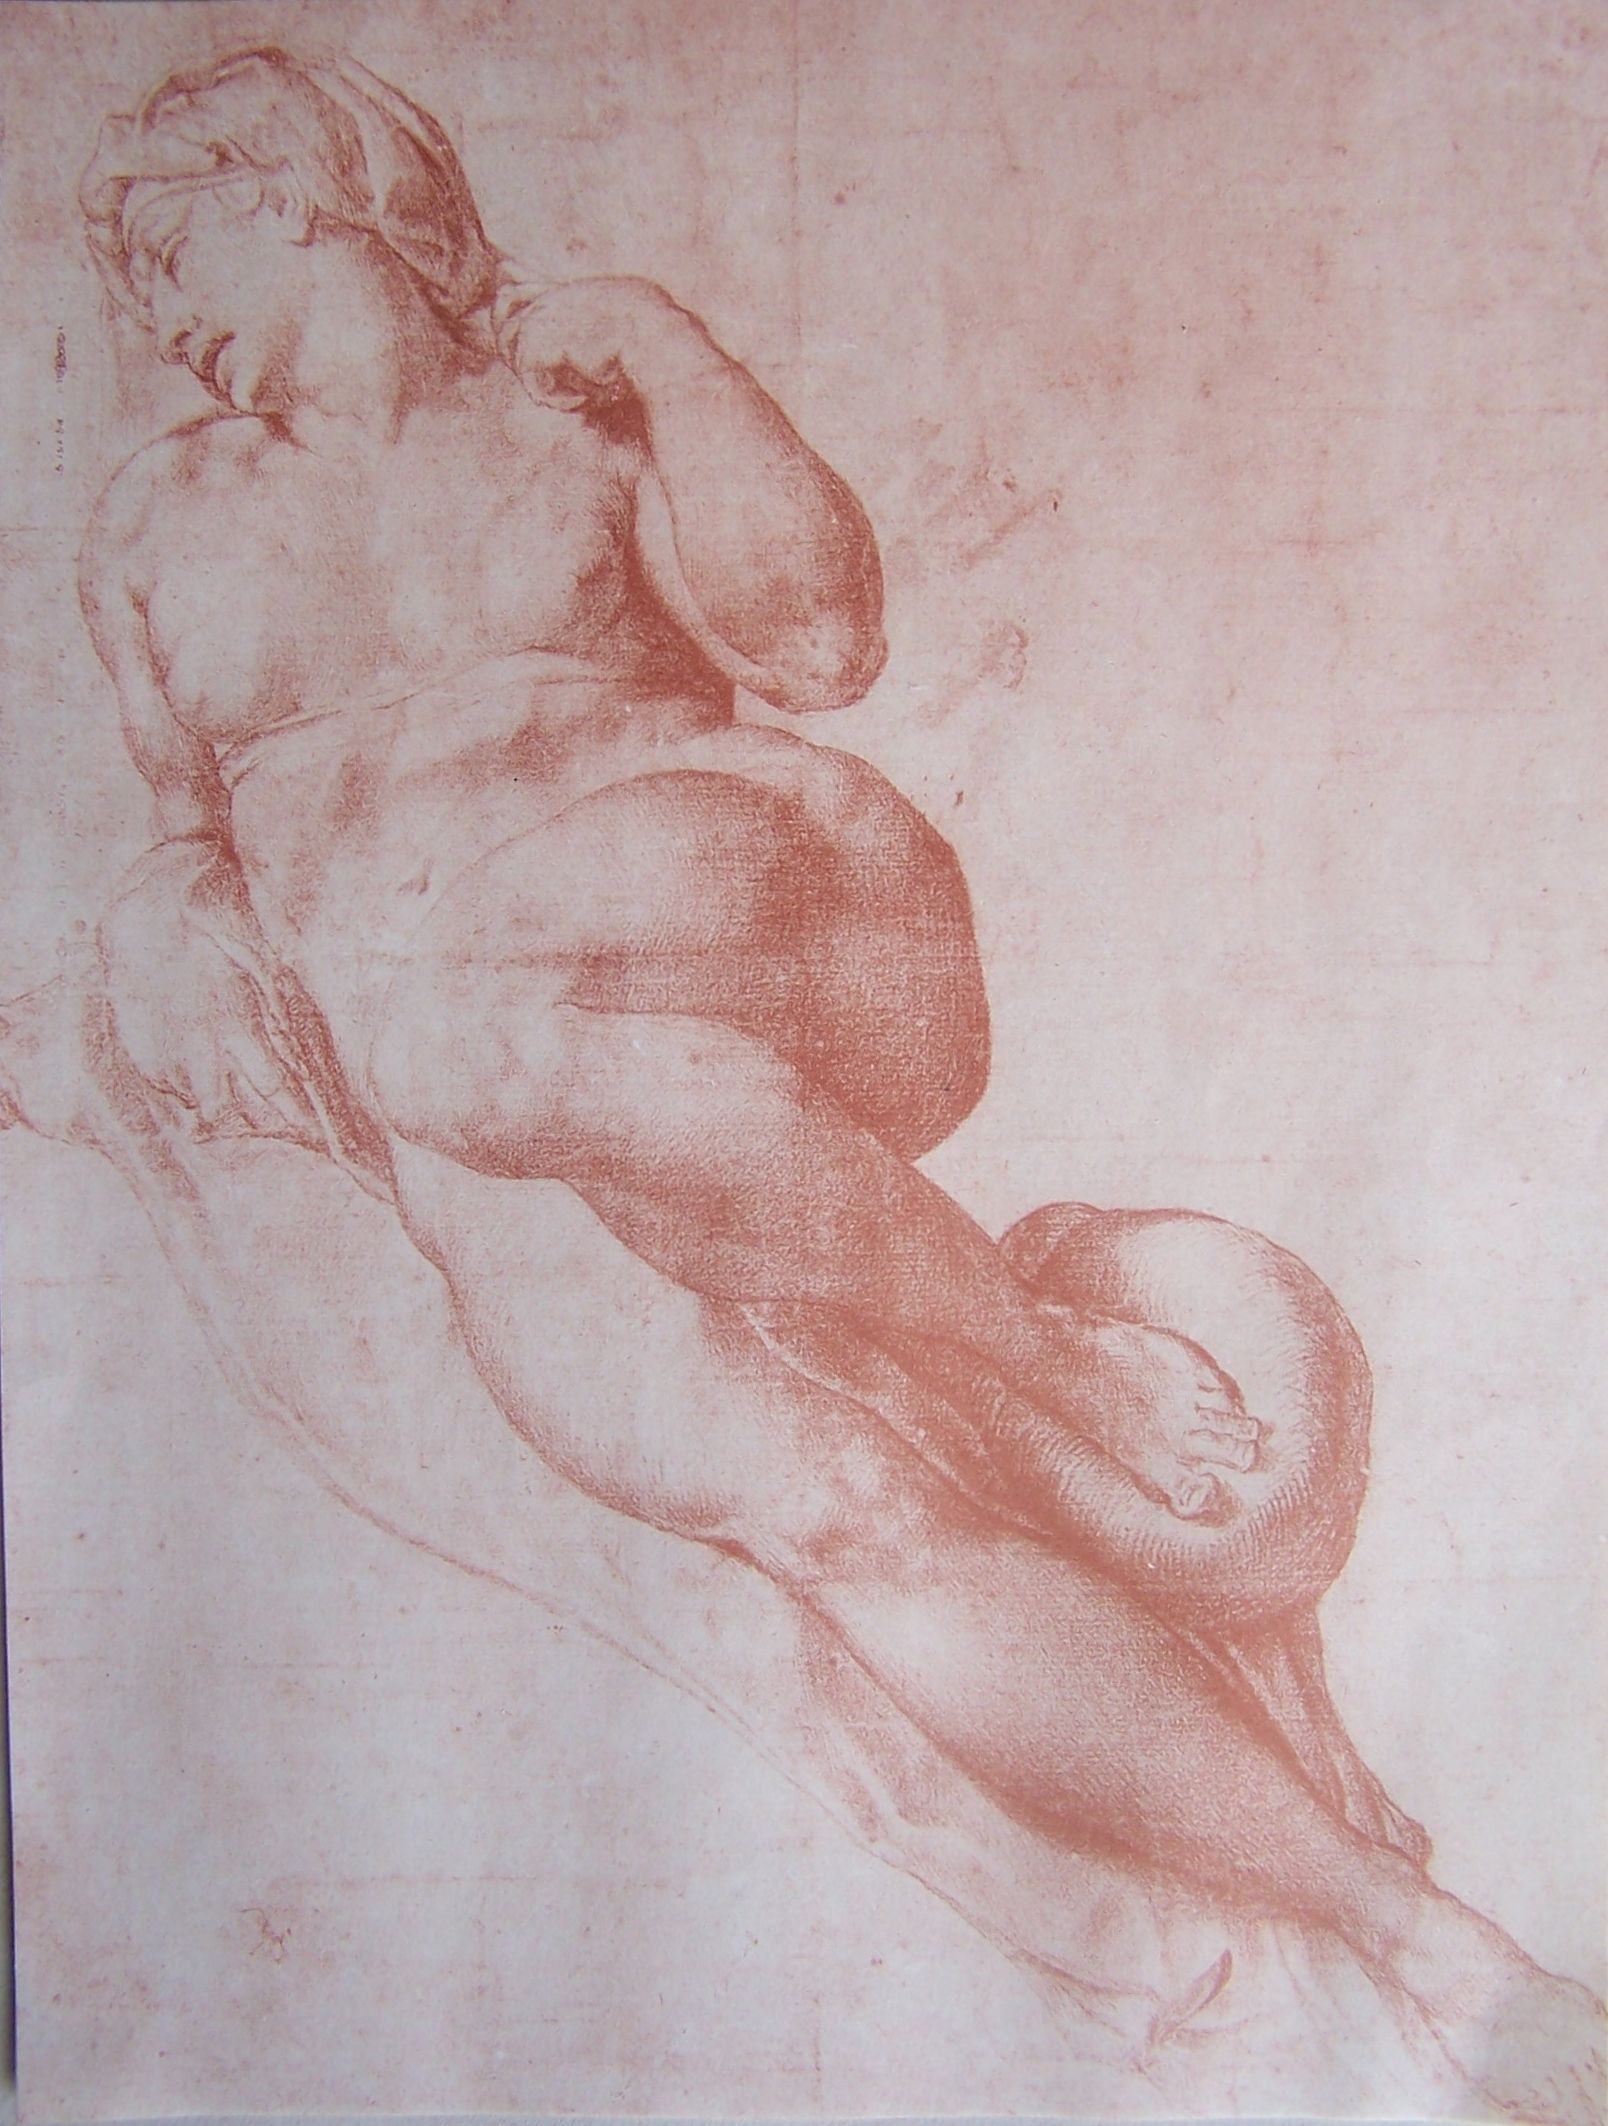 Michelangelo | Classico Disegno | Pinterest | Michelangelo, Drawings ...